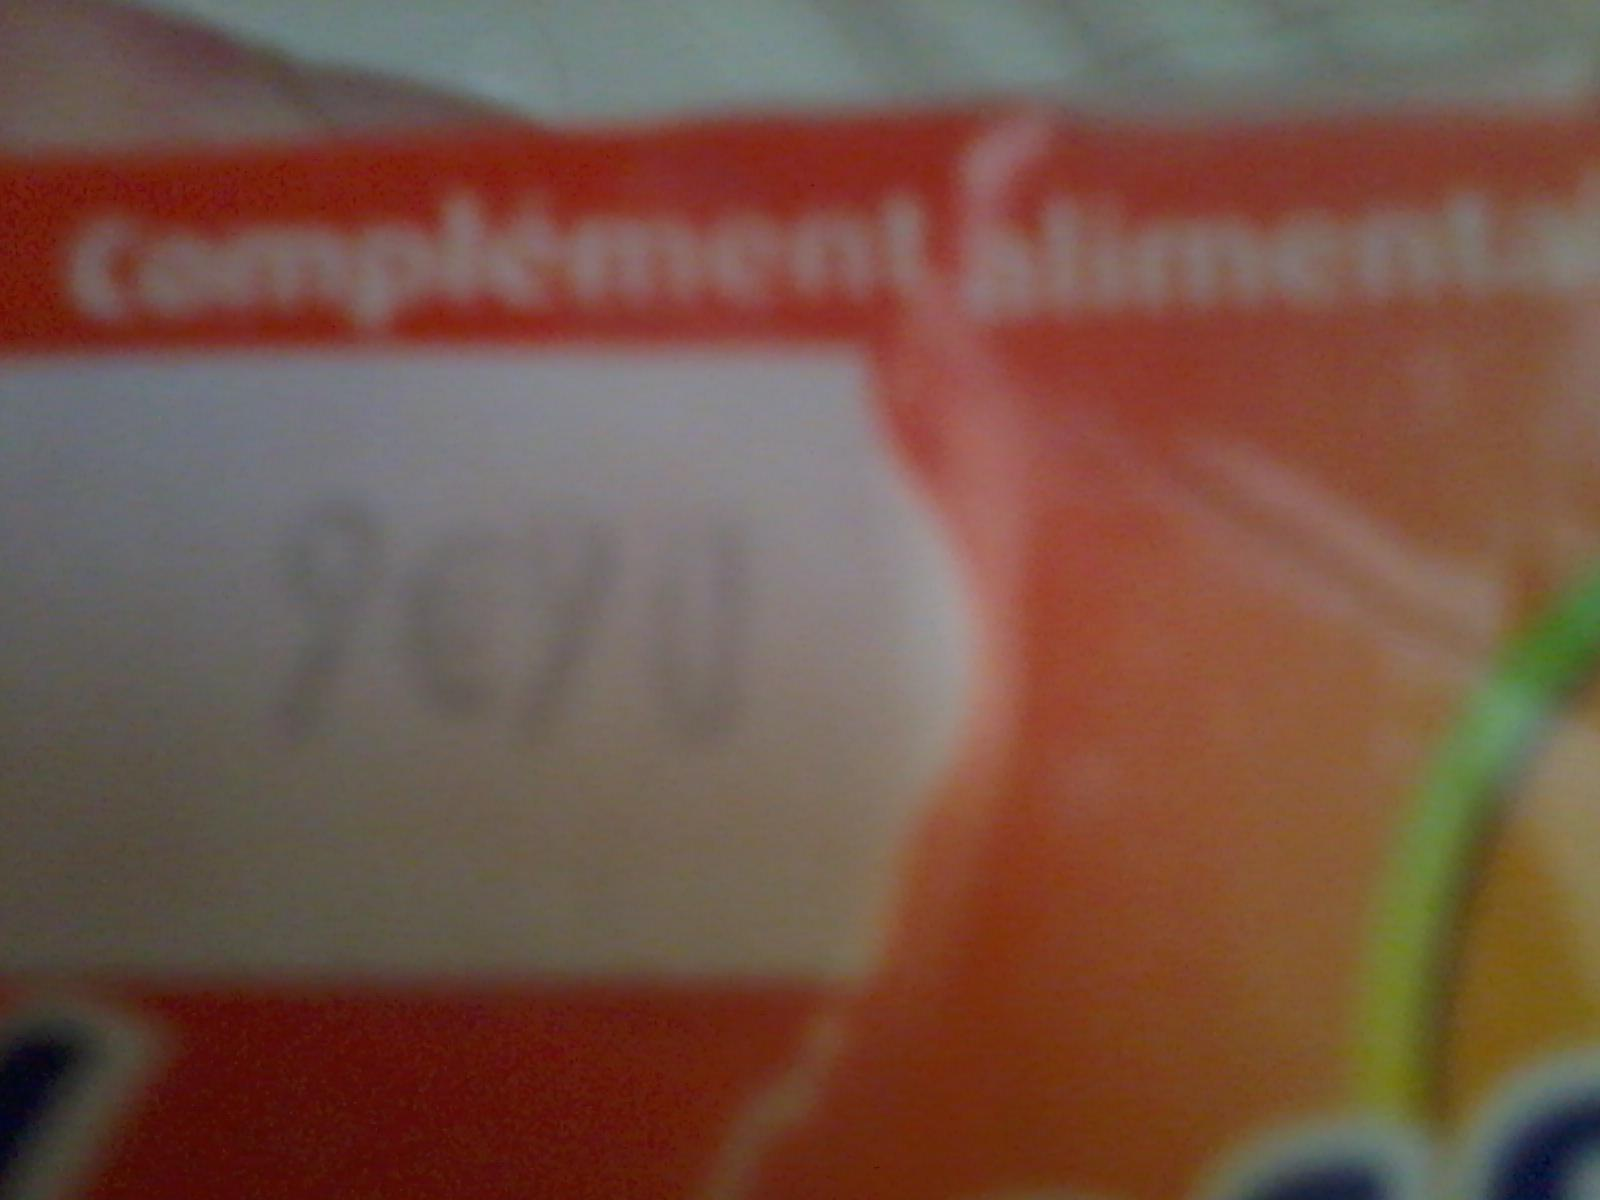 troc de troc reservees vava  flacon multis vitamines..manque 1 compr image 2